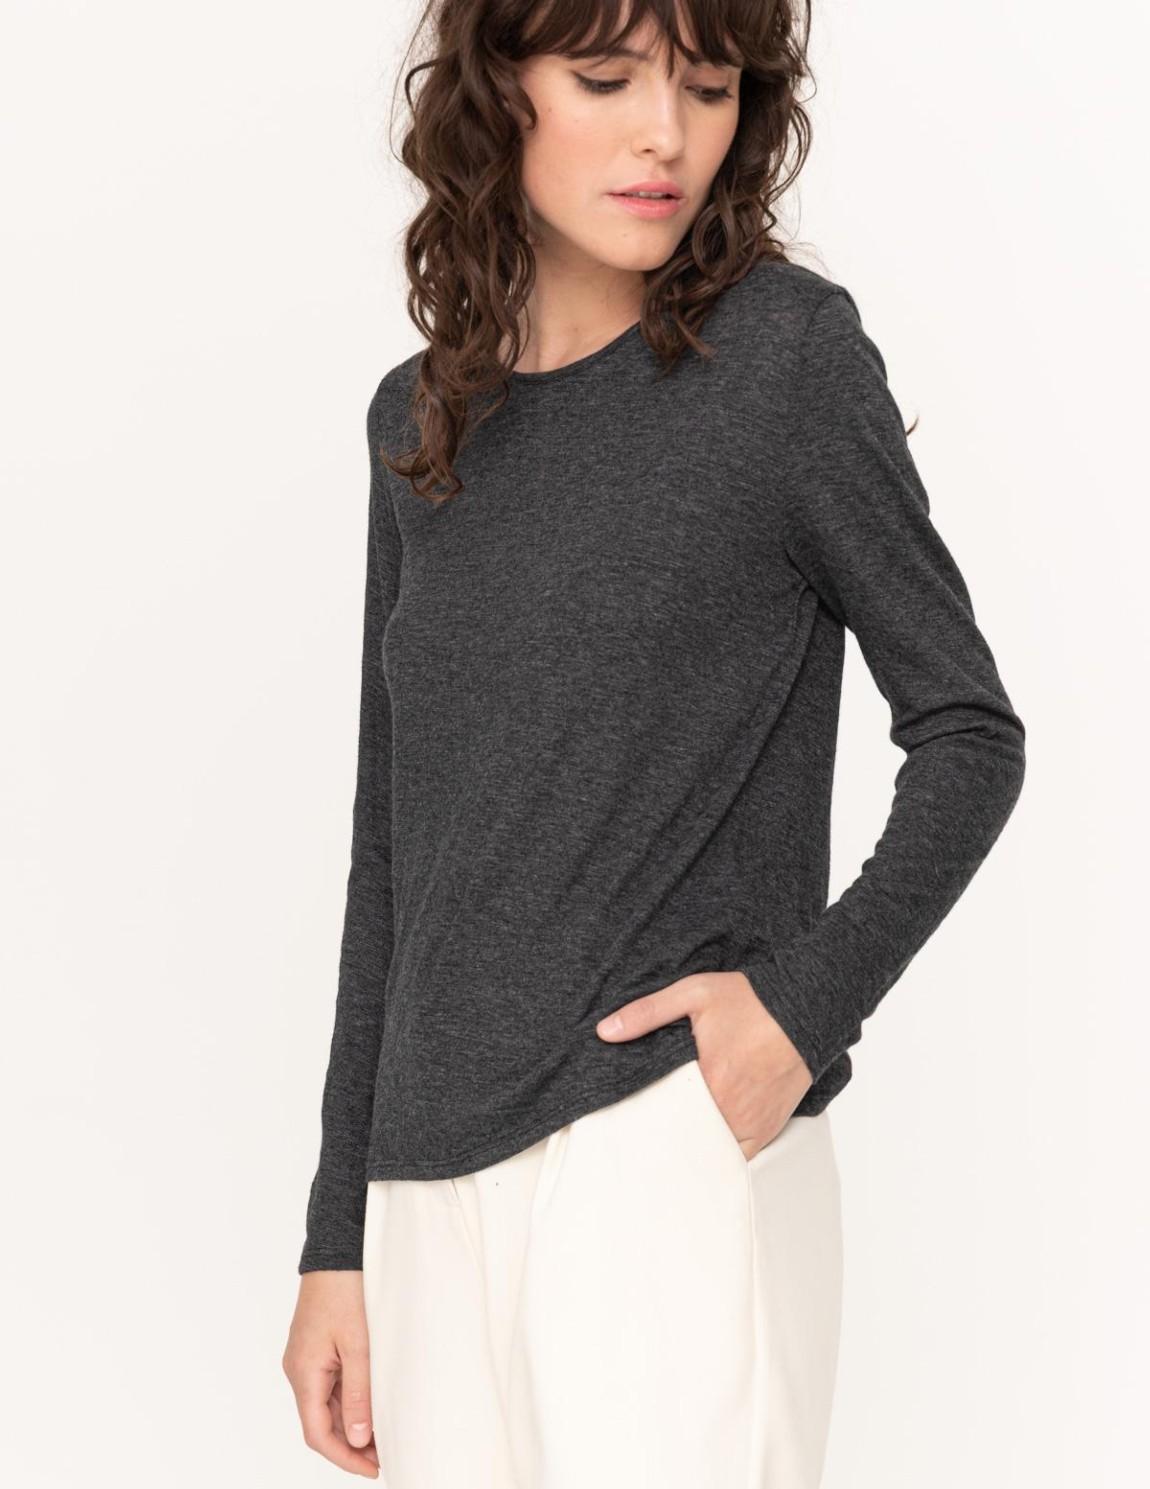 Camiseta cuello redondo - Ítem1